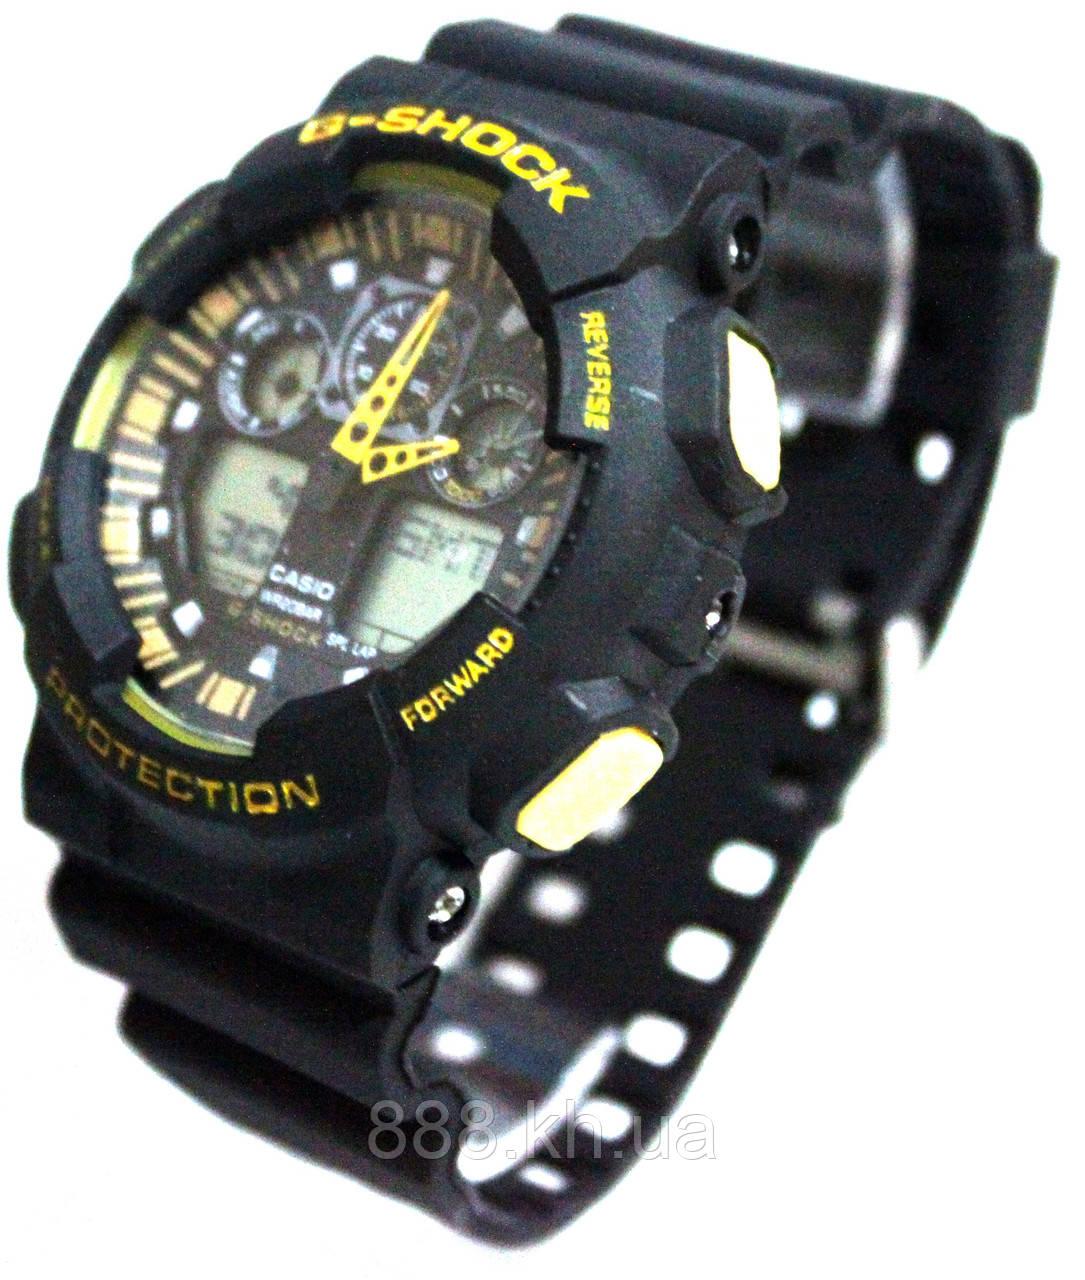 Casio g-shock ga-100 черный/желтый реплика